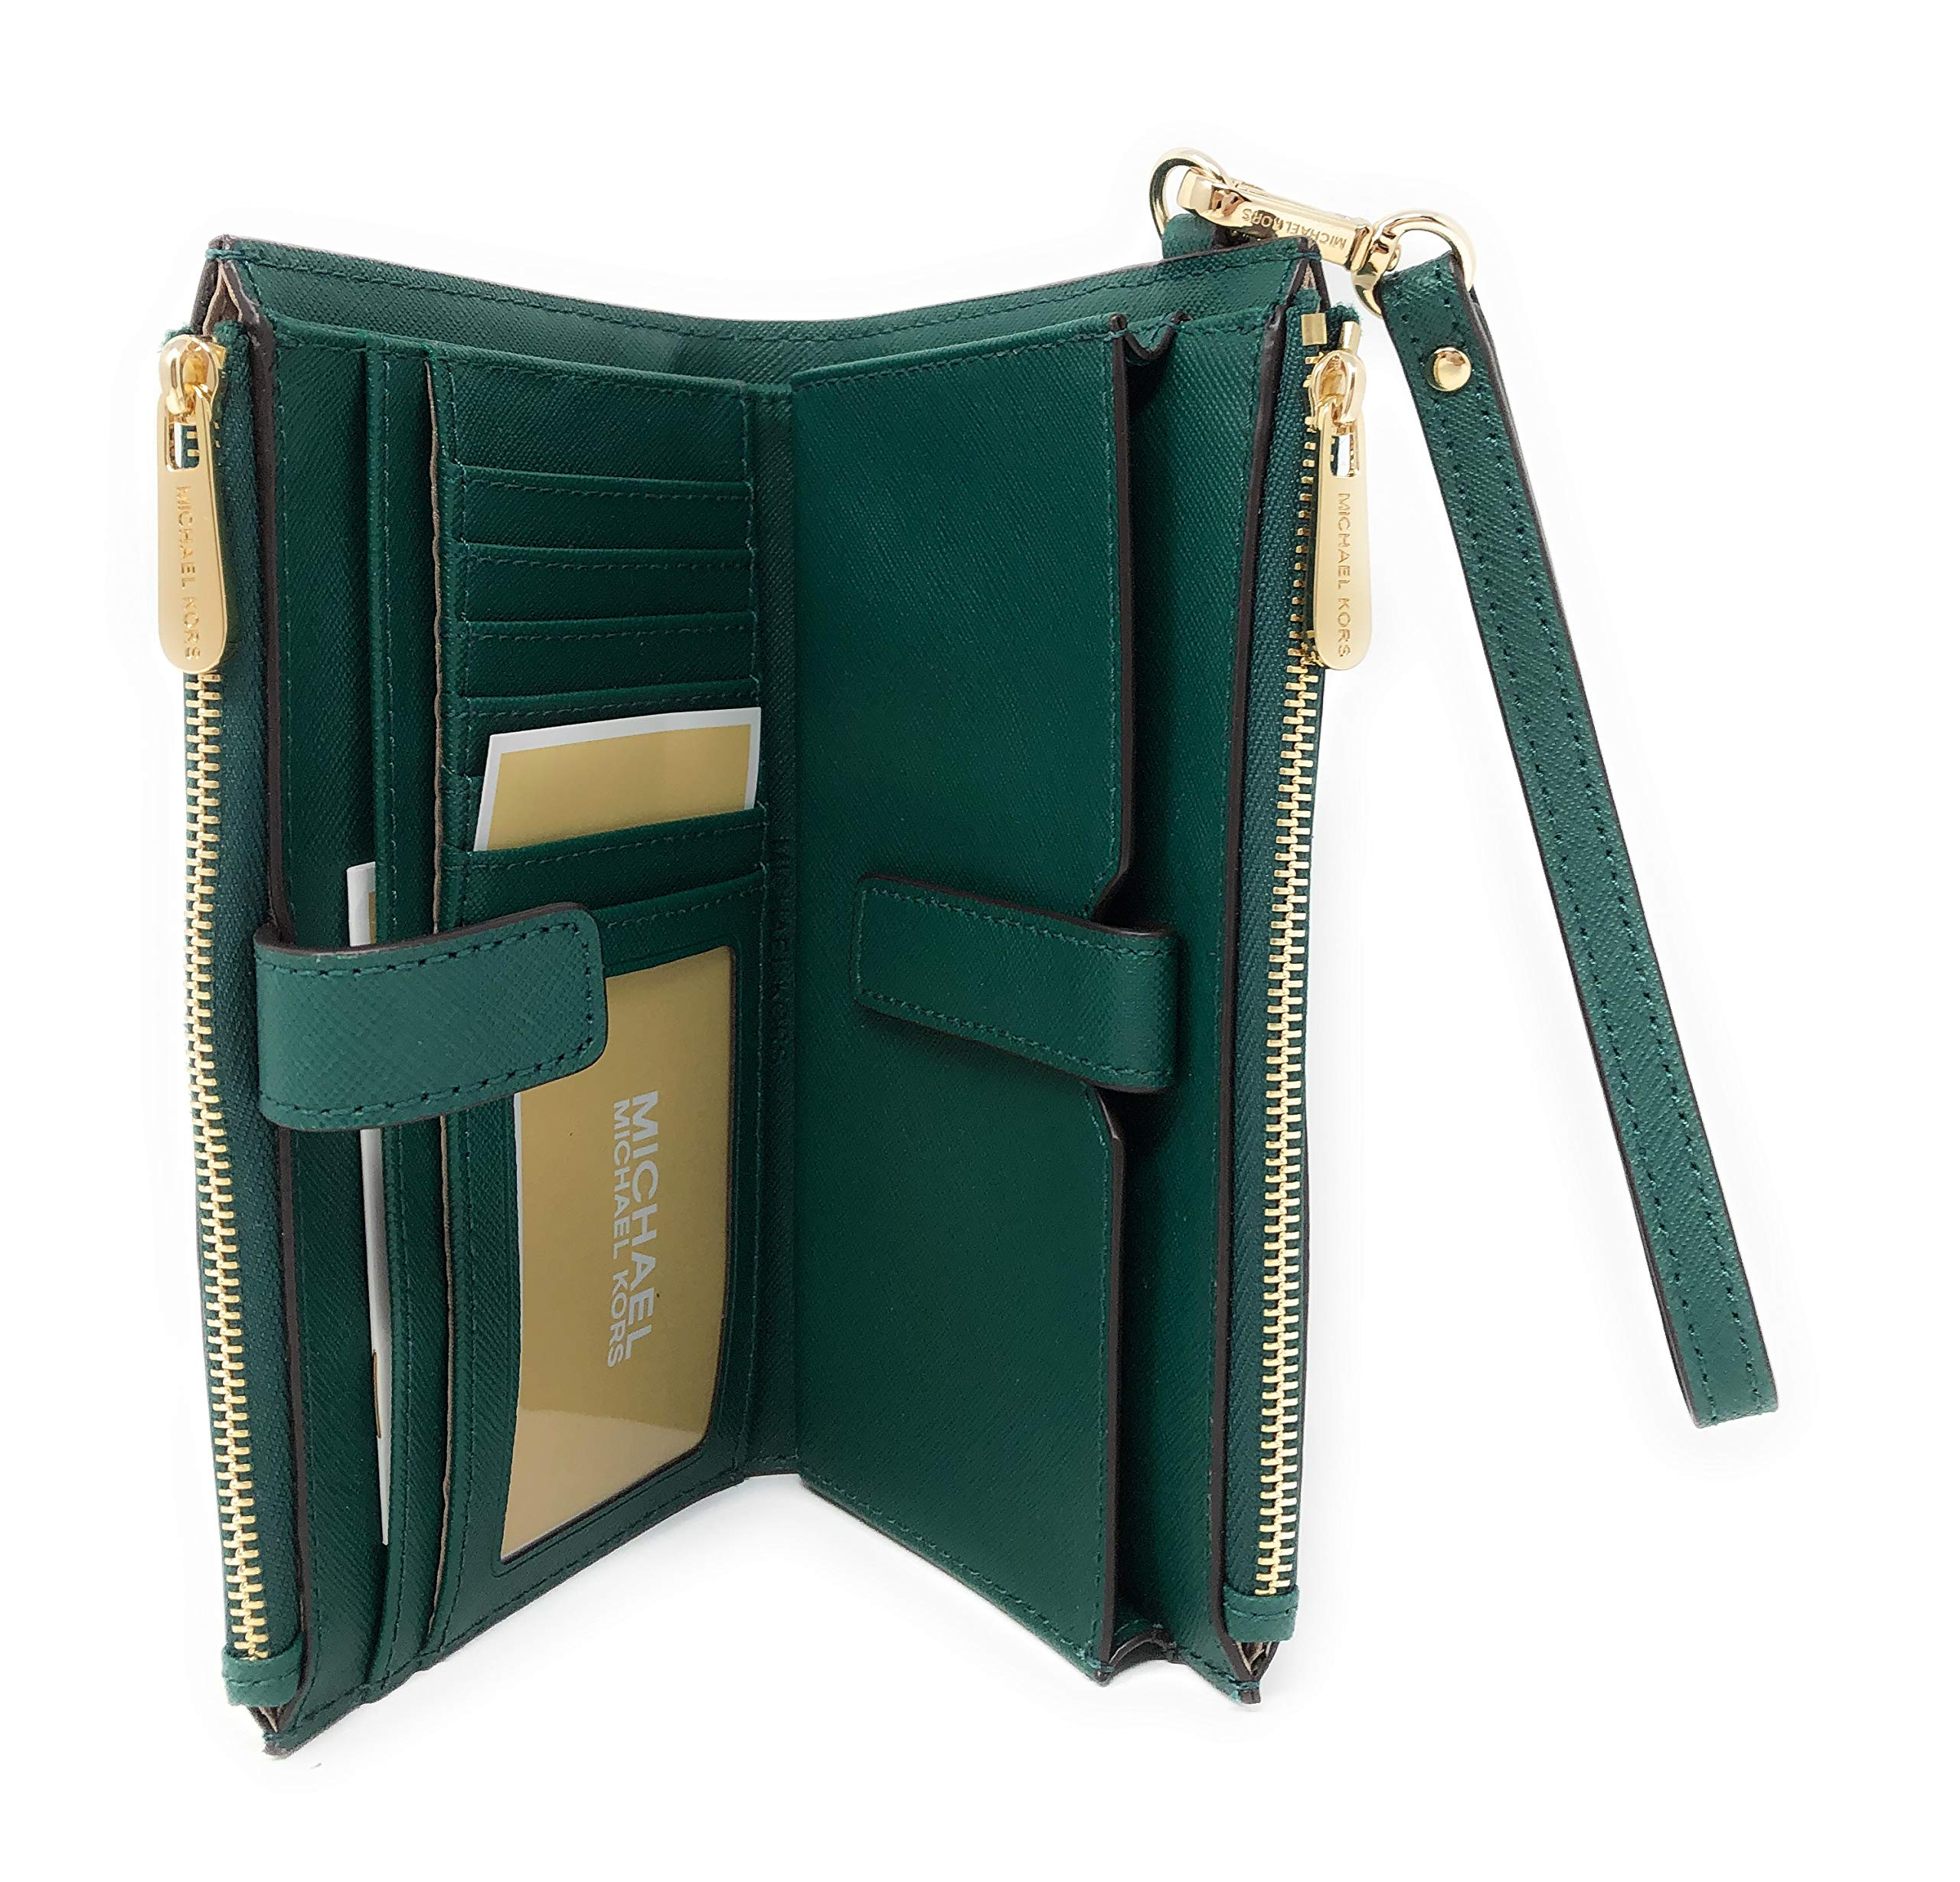 Michael Kors Jet Set Travel Double Zip Saffiano Leather Wristlet Wallet in Emerald by Michael Kors (Image #4)